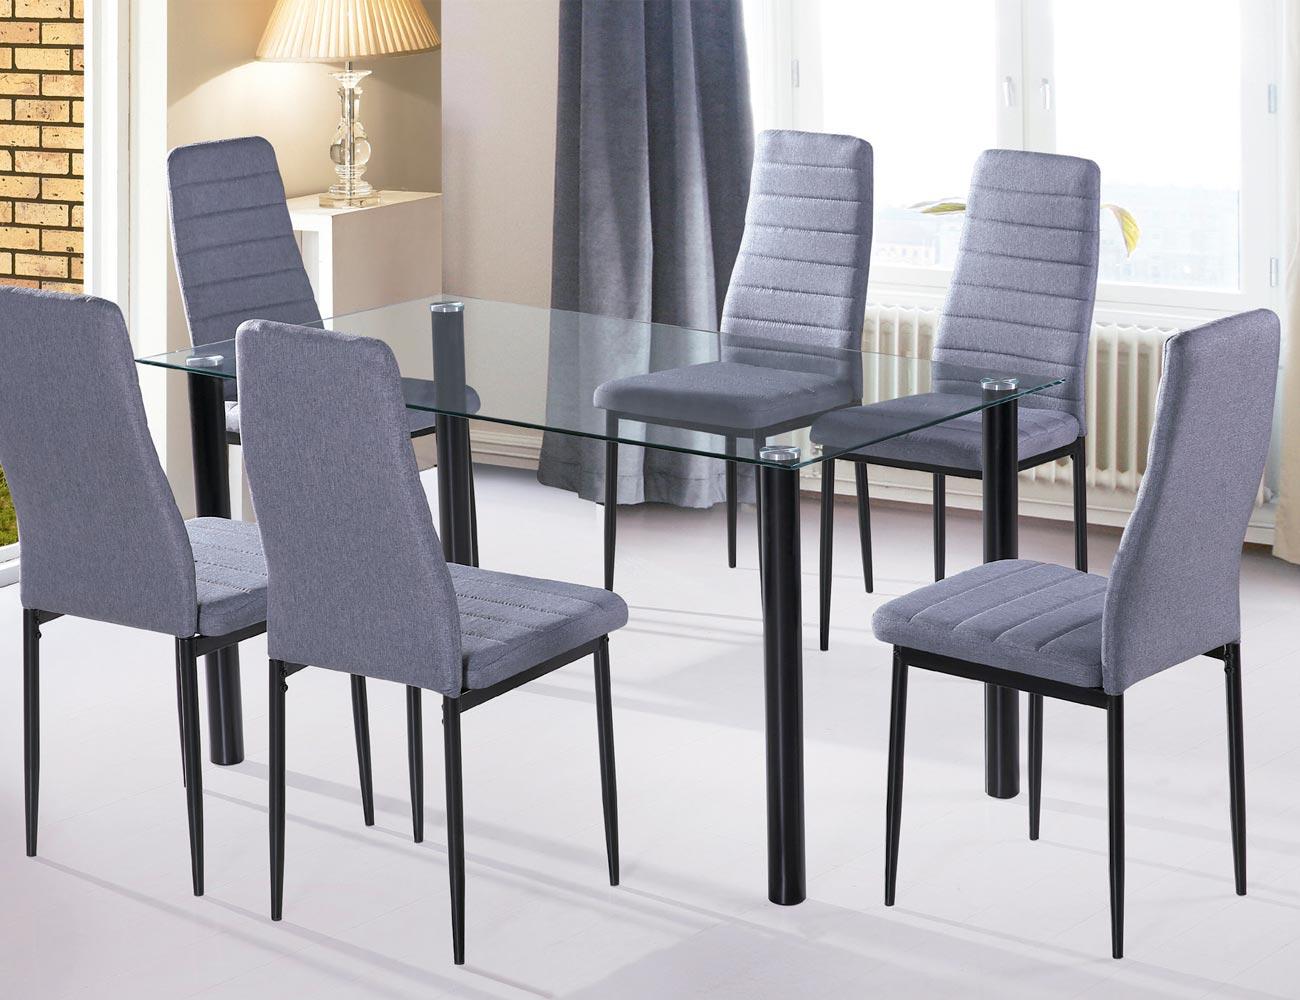 Muebles utrera factory obtenga ideas dise o de muebles for Tu factory del mueble